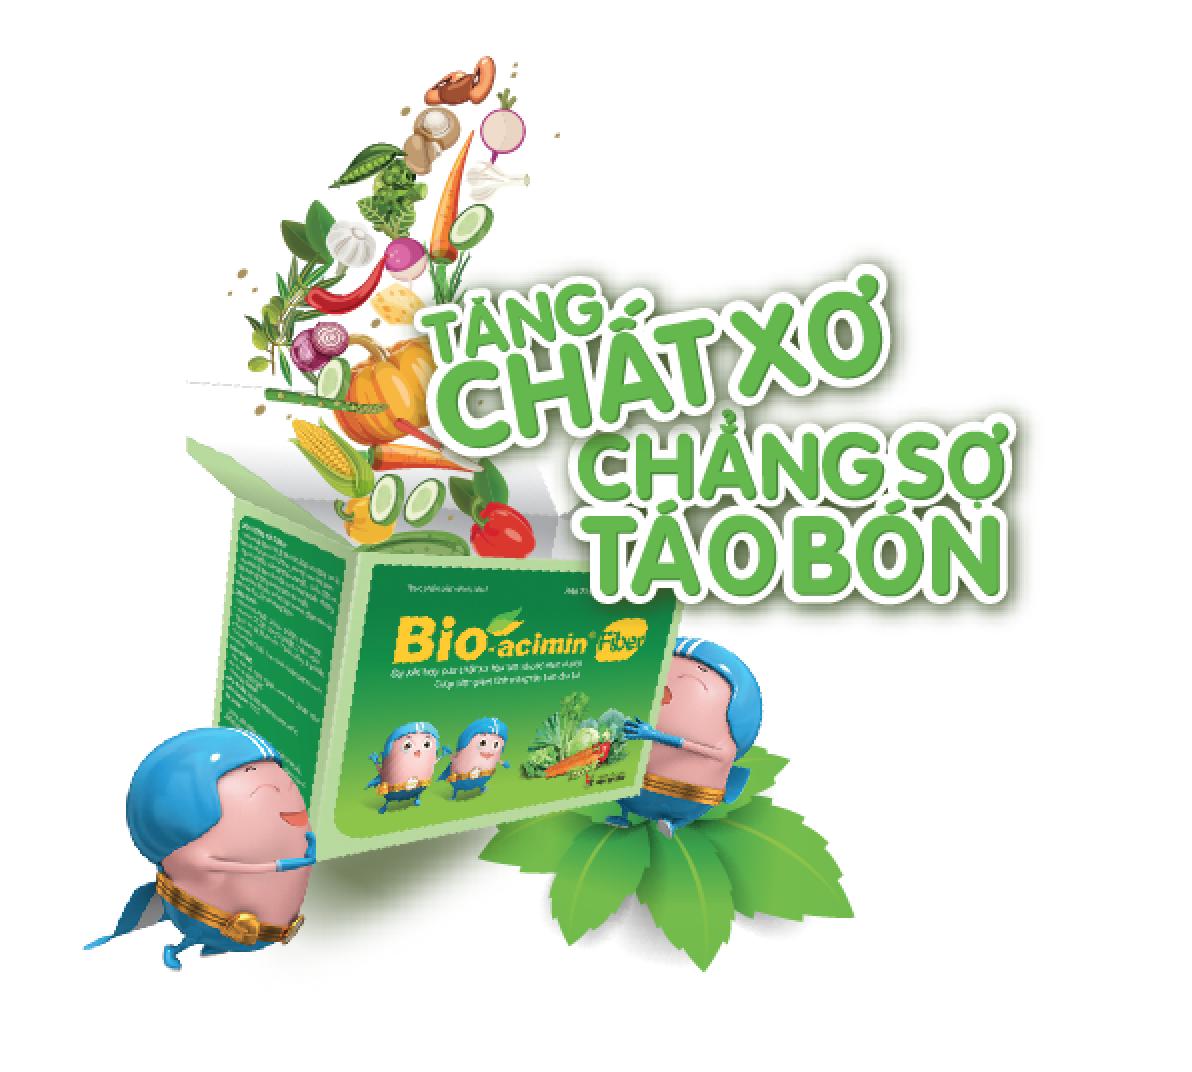 bioacimin_dec_anh-3_luu-y-khi-dung-sua-cho-tre-bi-tao-bon